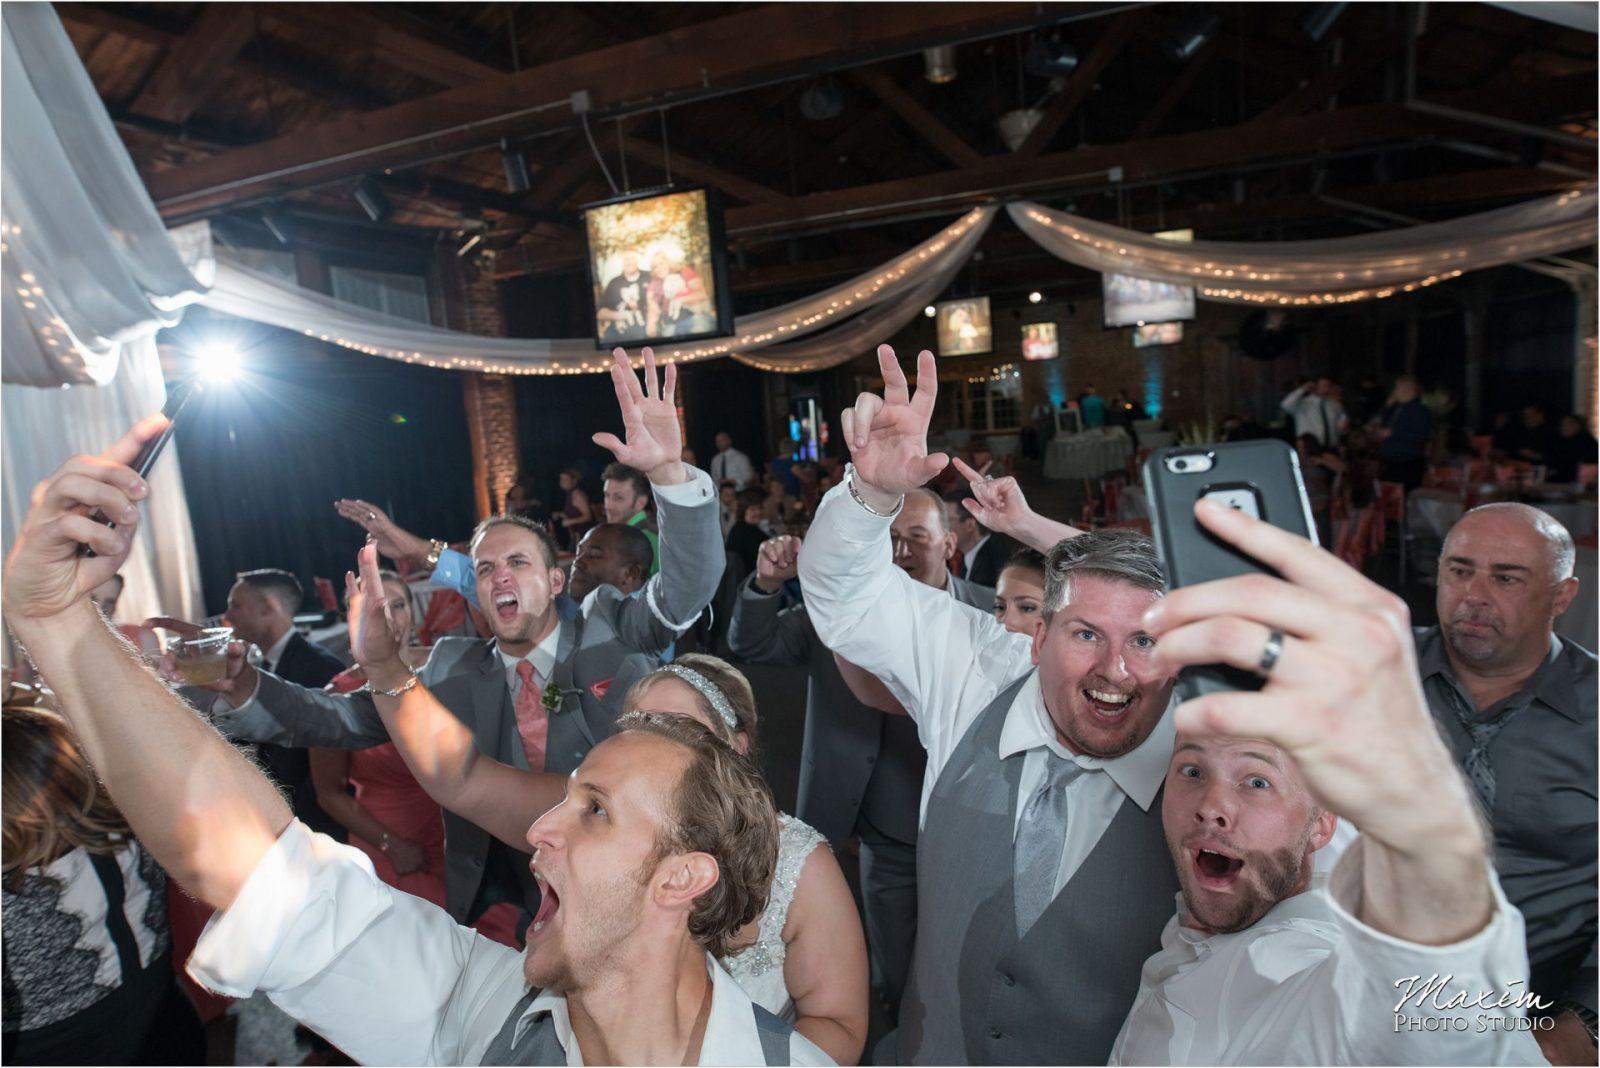 Top of the Market Dayton Ohio Wedding Reception dance